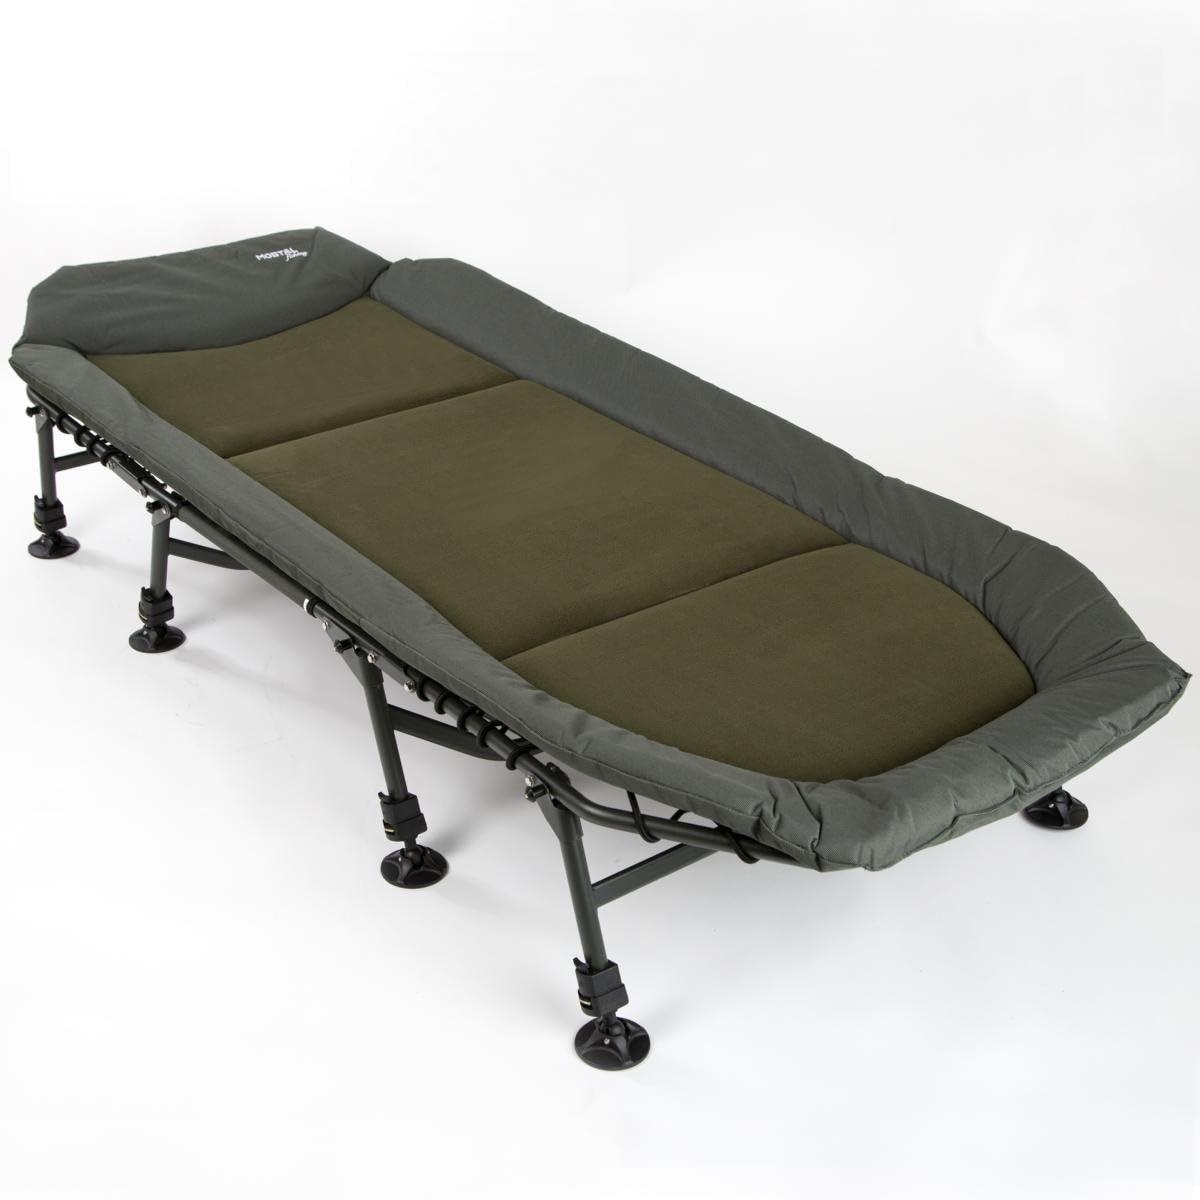 Mostal Alu King Size Bedchair 8-Bein Liege Deluxe Angelliege XXL